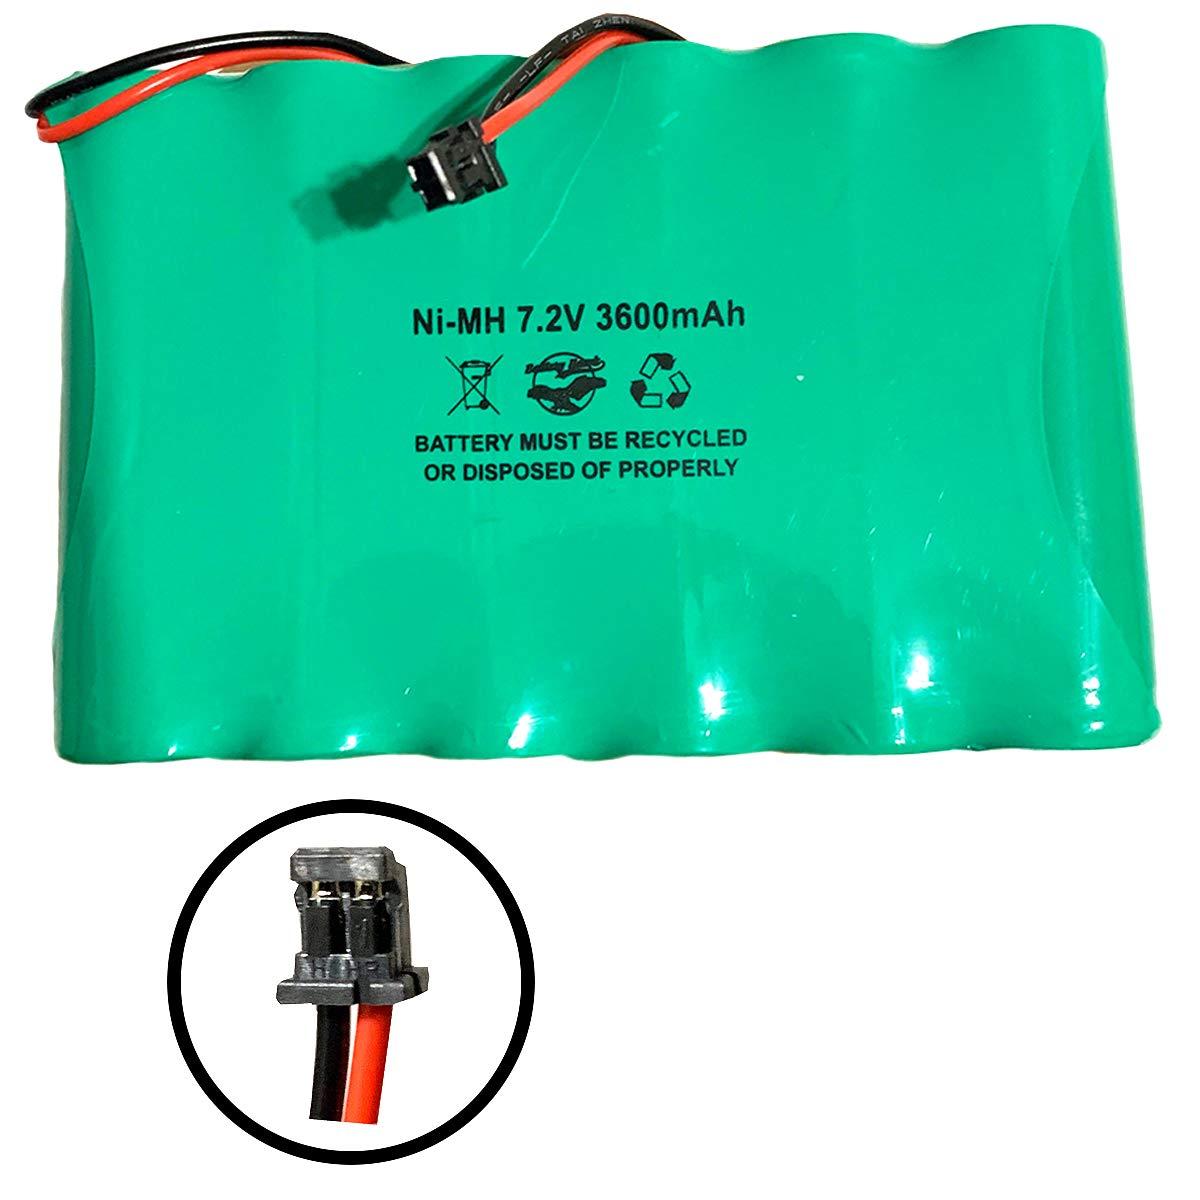 DSC IMPASSA 9057 Battery 6PH-H-4/3A3600-S-D22